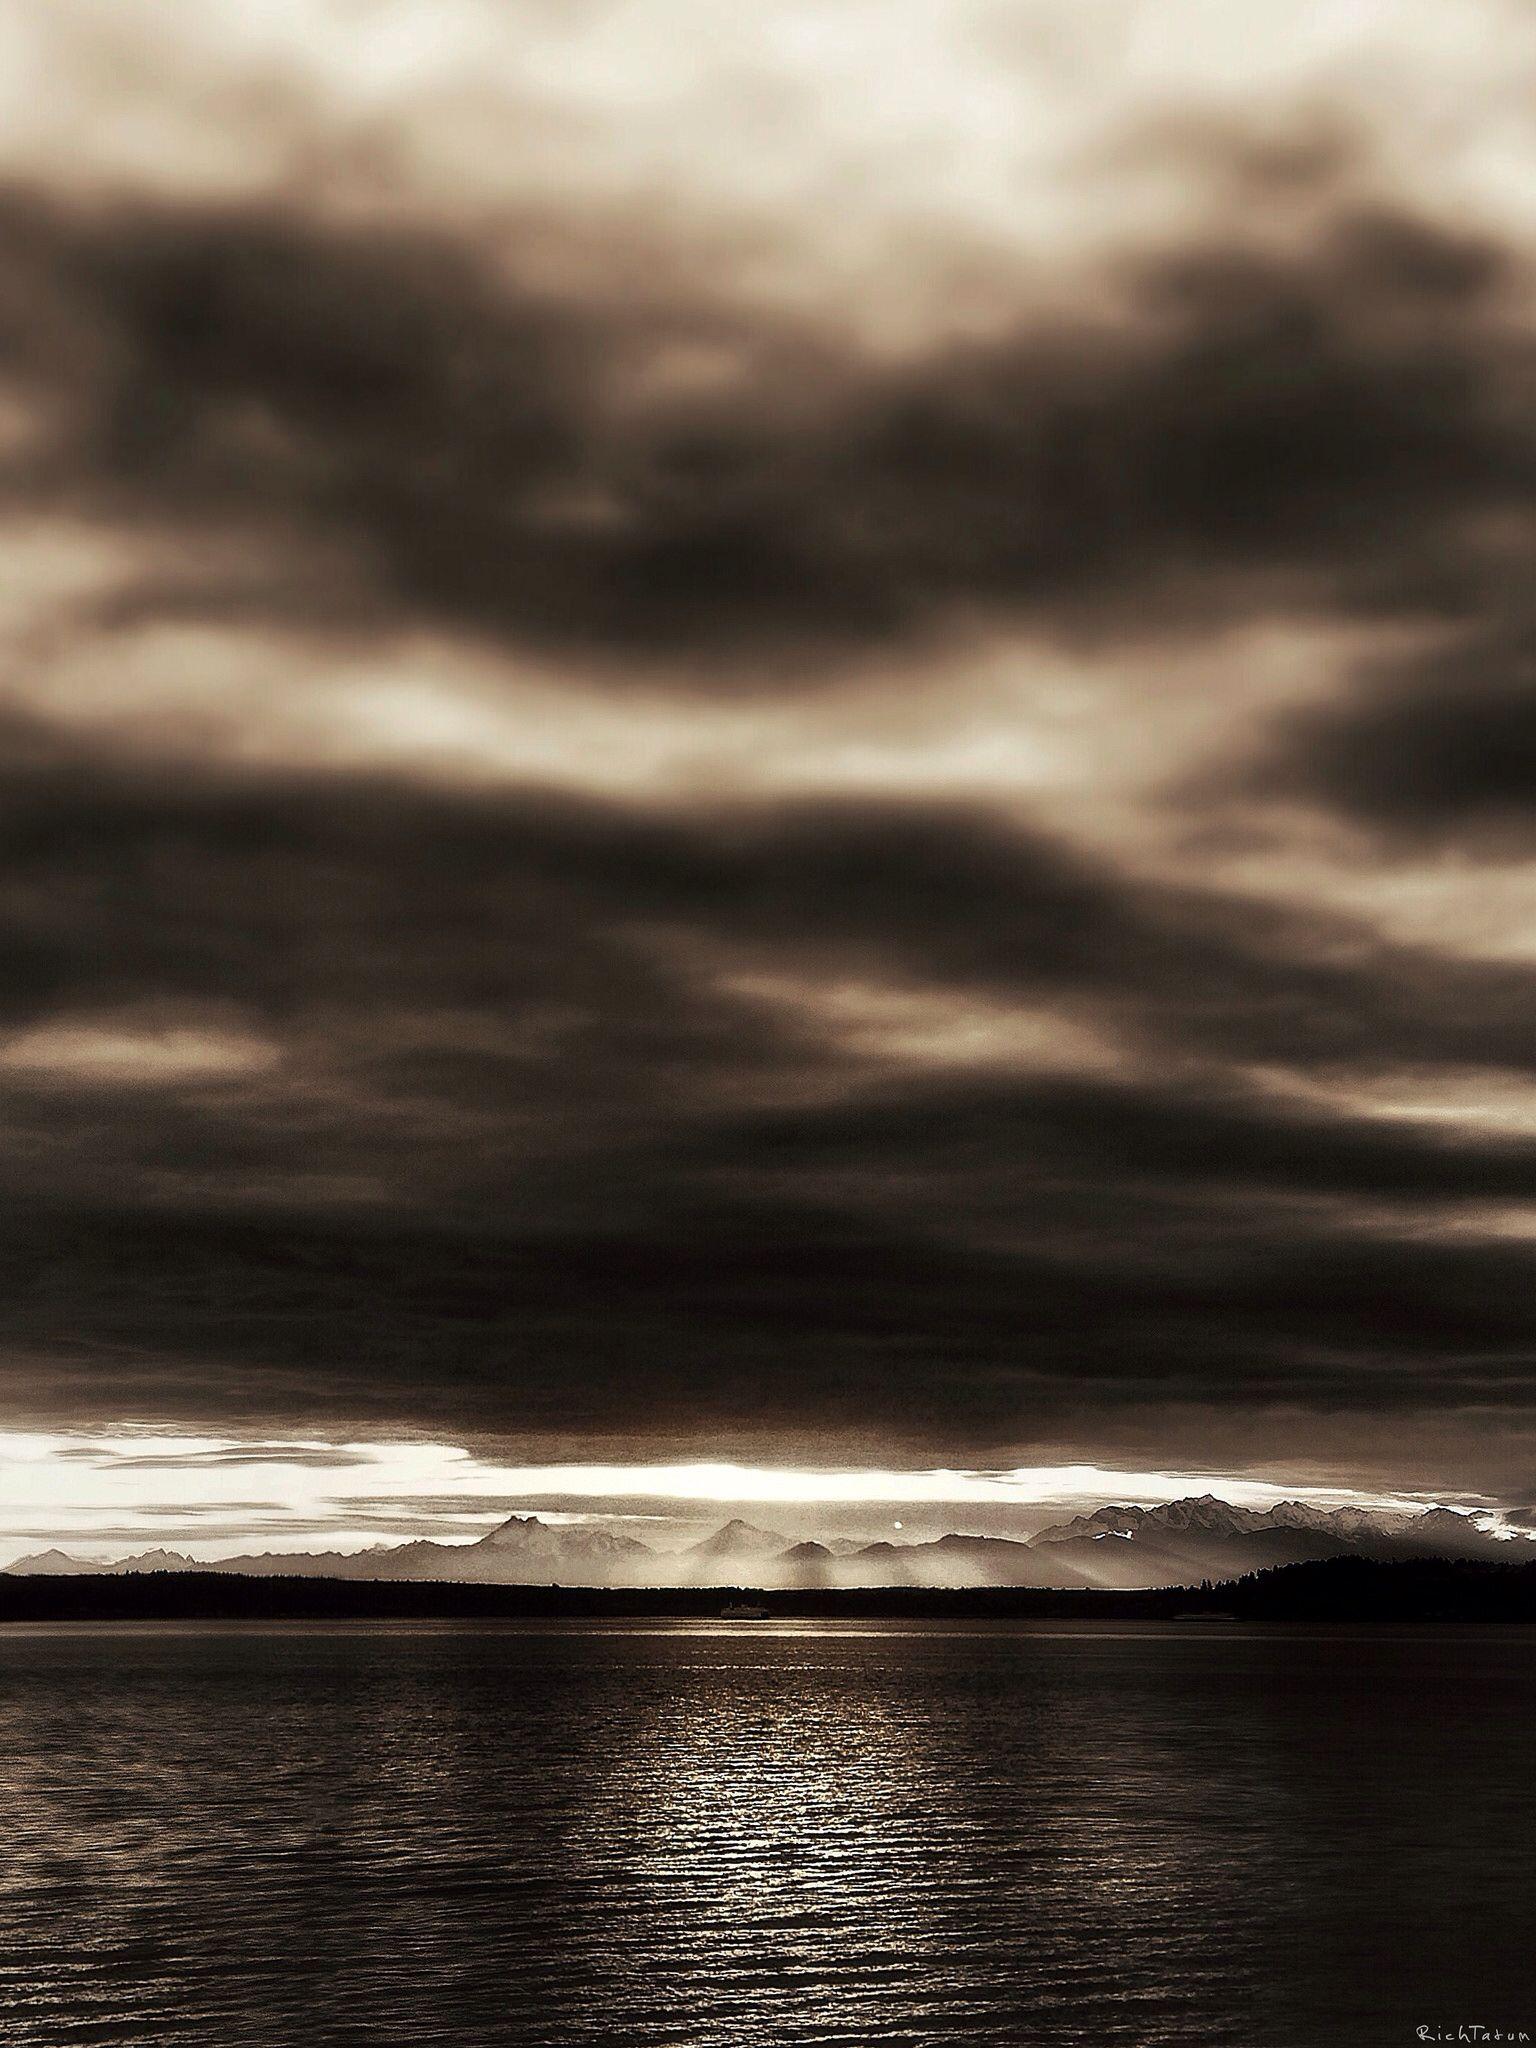 Sunset at Marina Beach Park, Edmonds, Washington. (Explore)